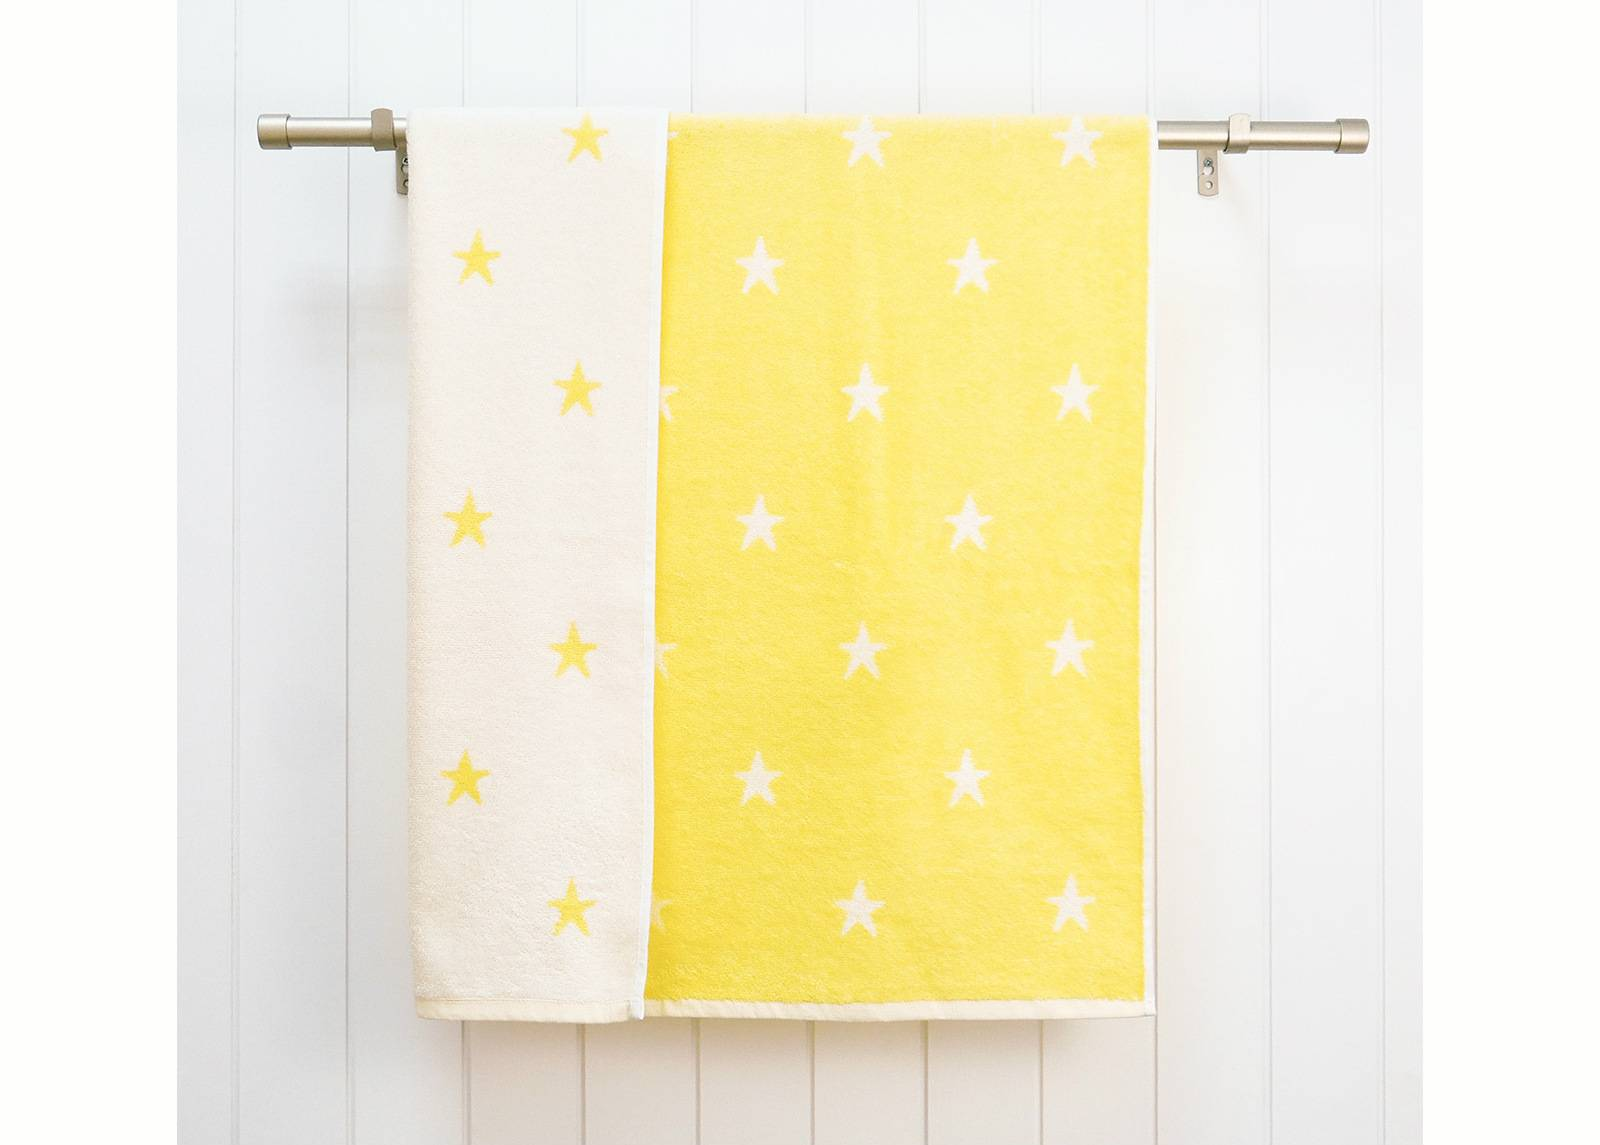 ARDENZA BABY Lasten froteepyyhe Stars 70x120 cm, keltainen